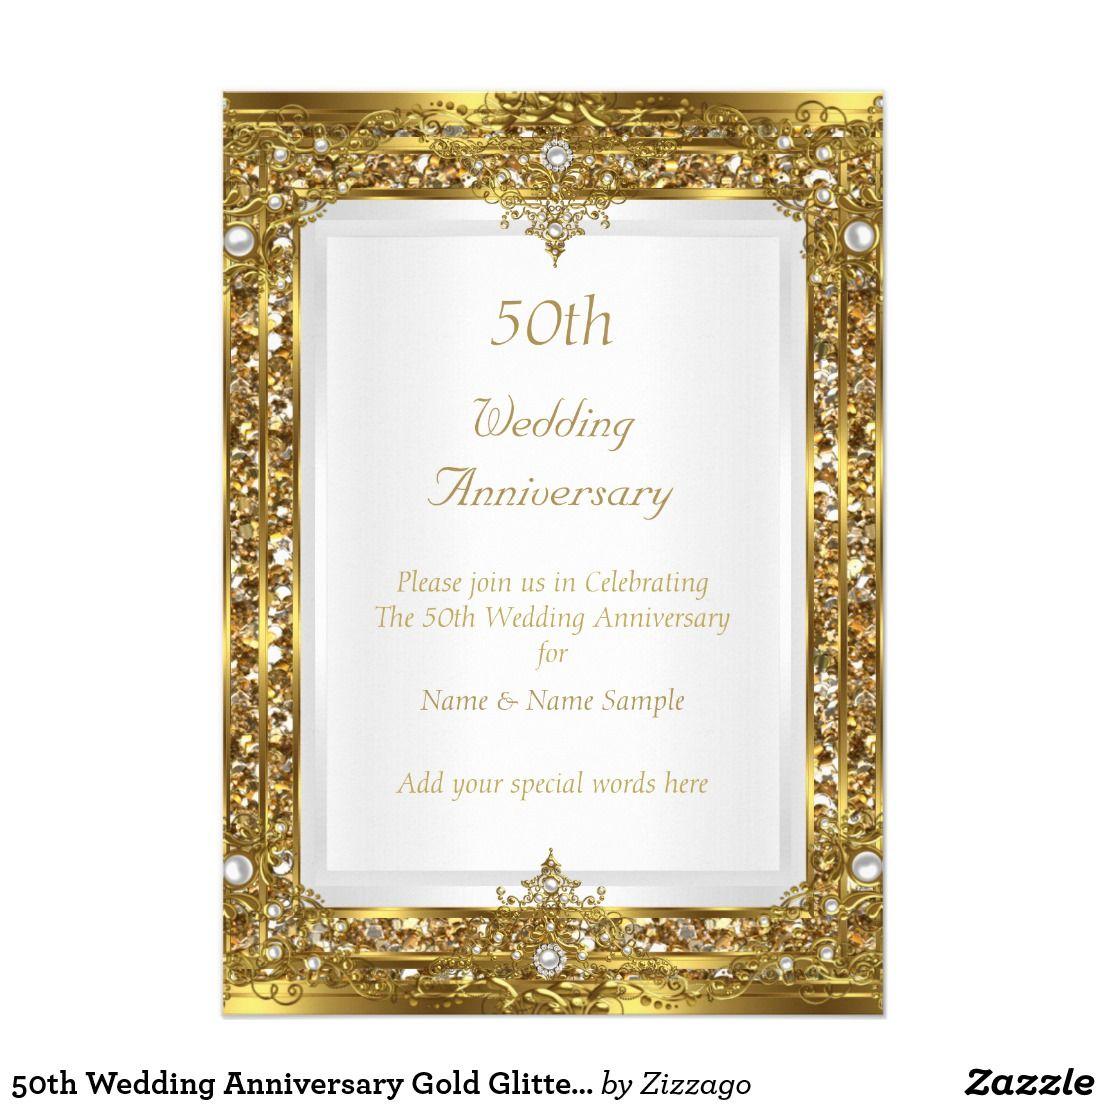 50th Wedding Anniversary Gold Glitter White Pearl Card | 50th ...